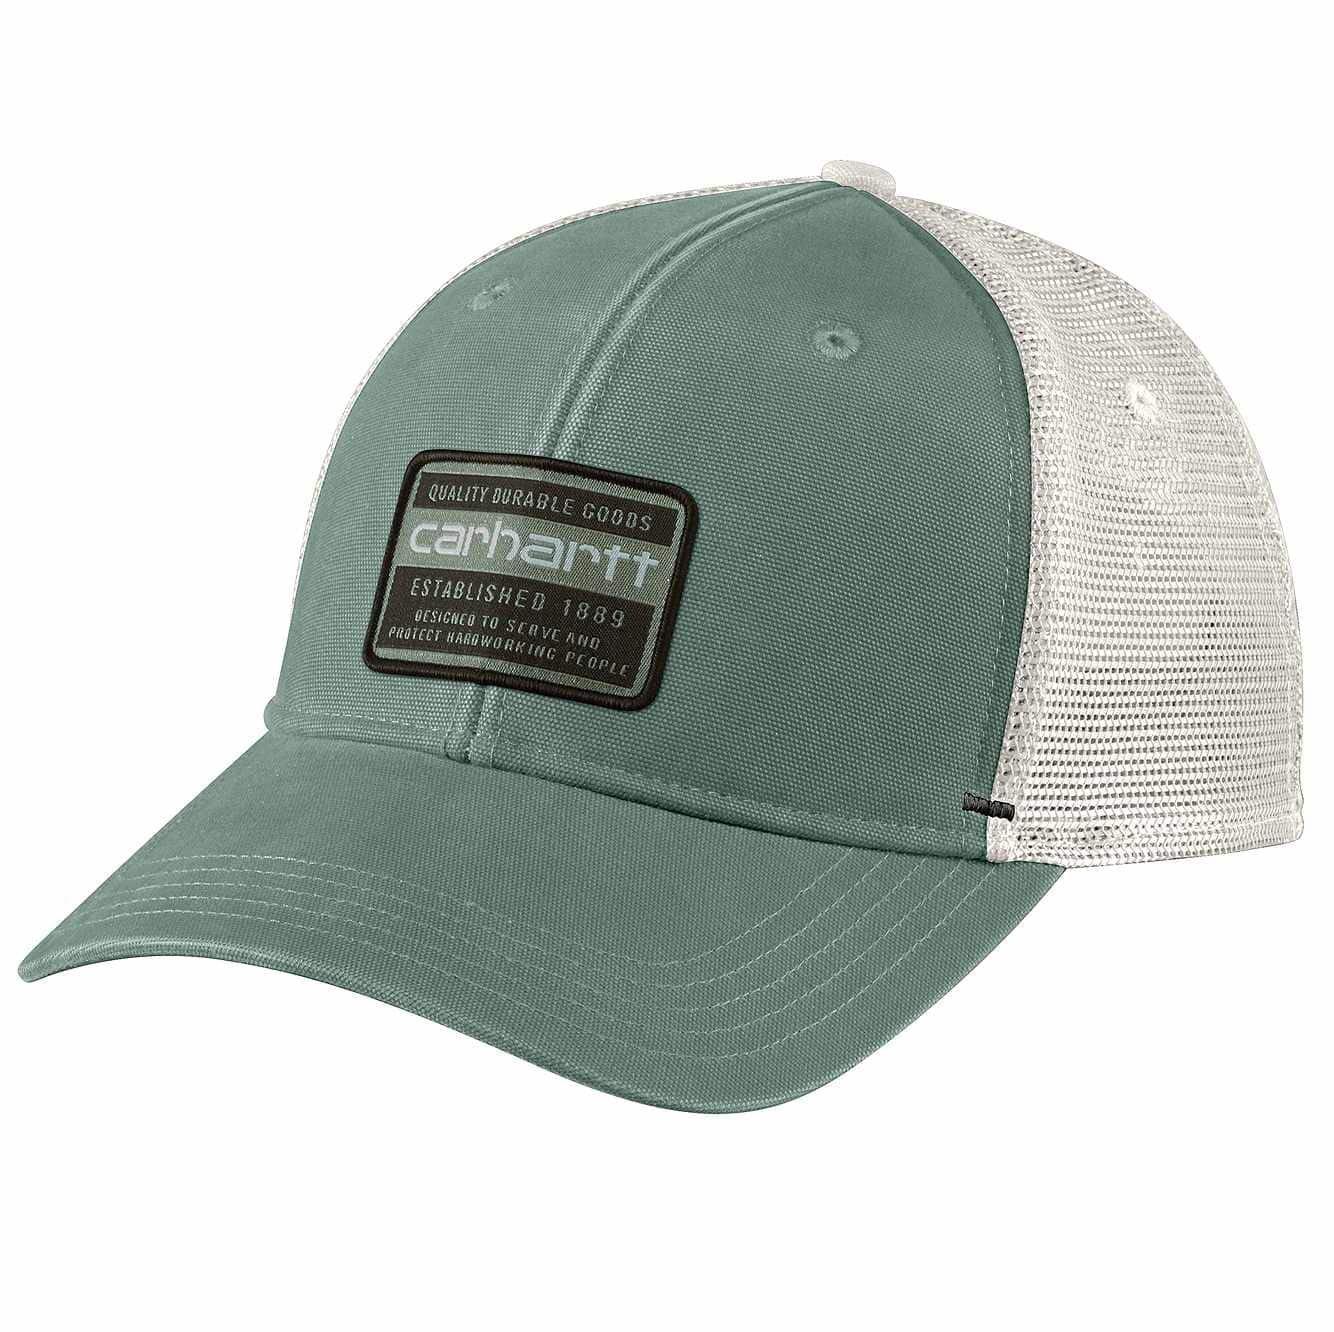 Carhartt Mesh Back Quality Graphic Cap - Leaf Green 104723